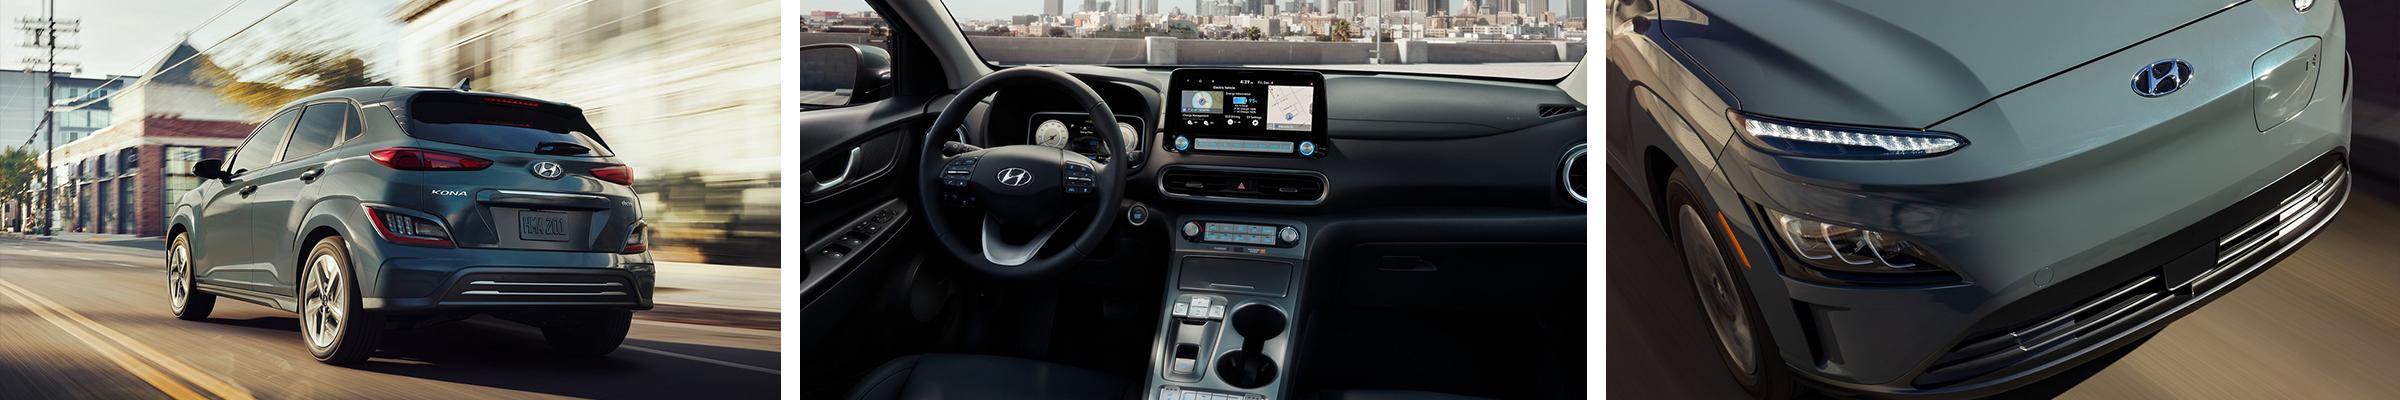 2022 Hyundai Kona Electric For Sale Dearborn MI   Detroit